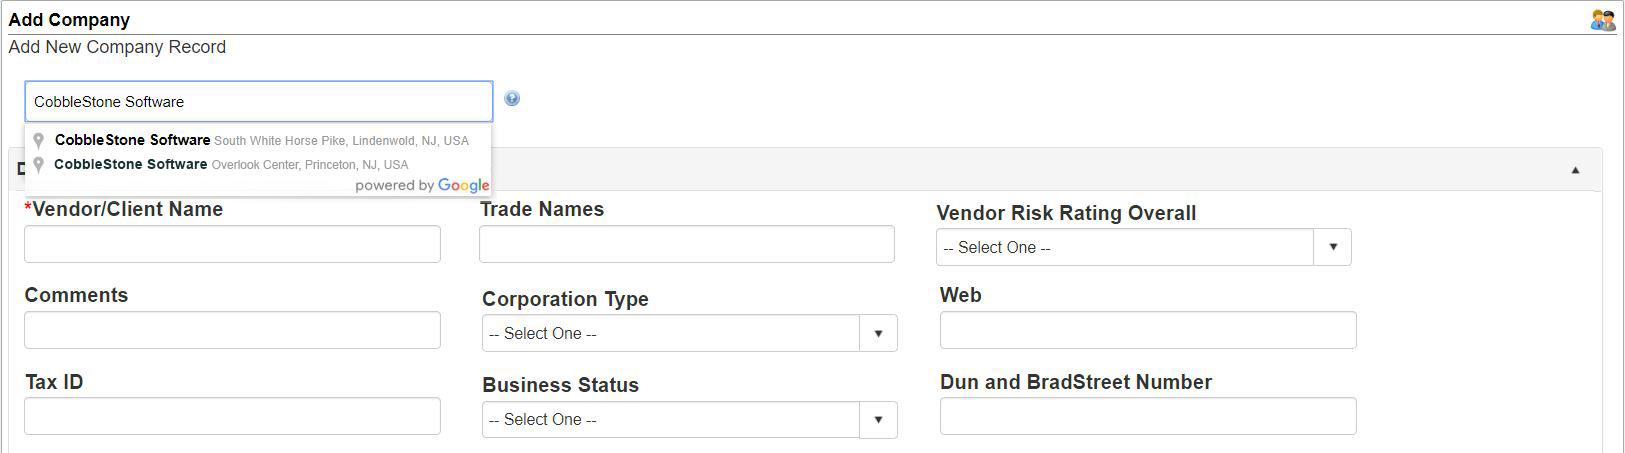 CobbleStone Google Integration for easy vendor lookup.